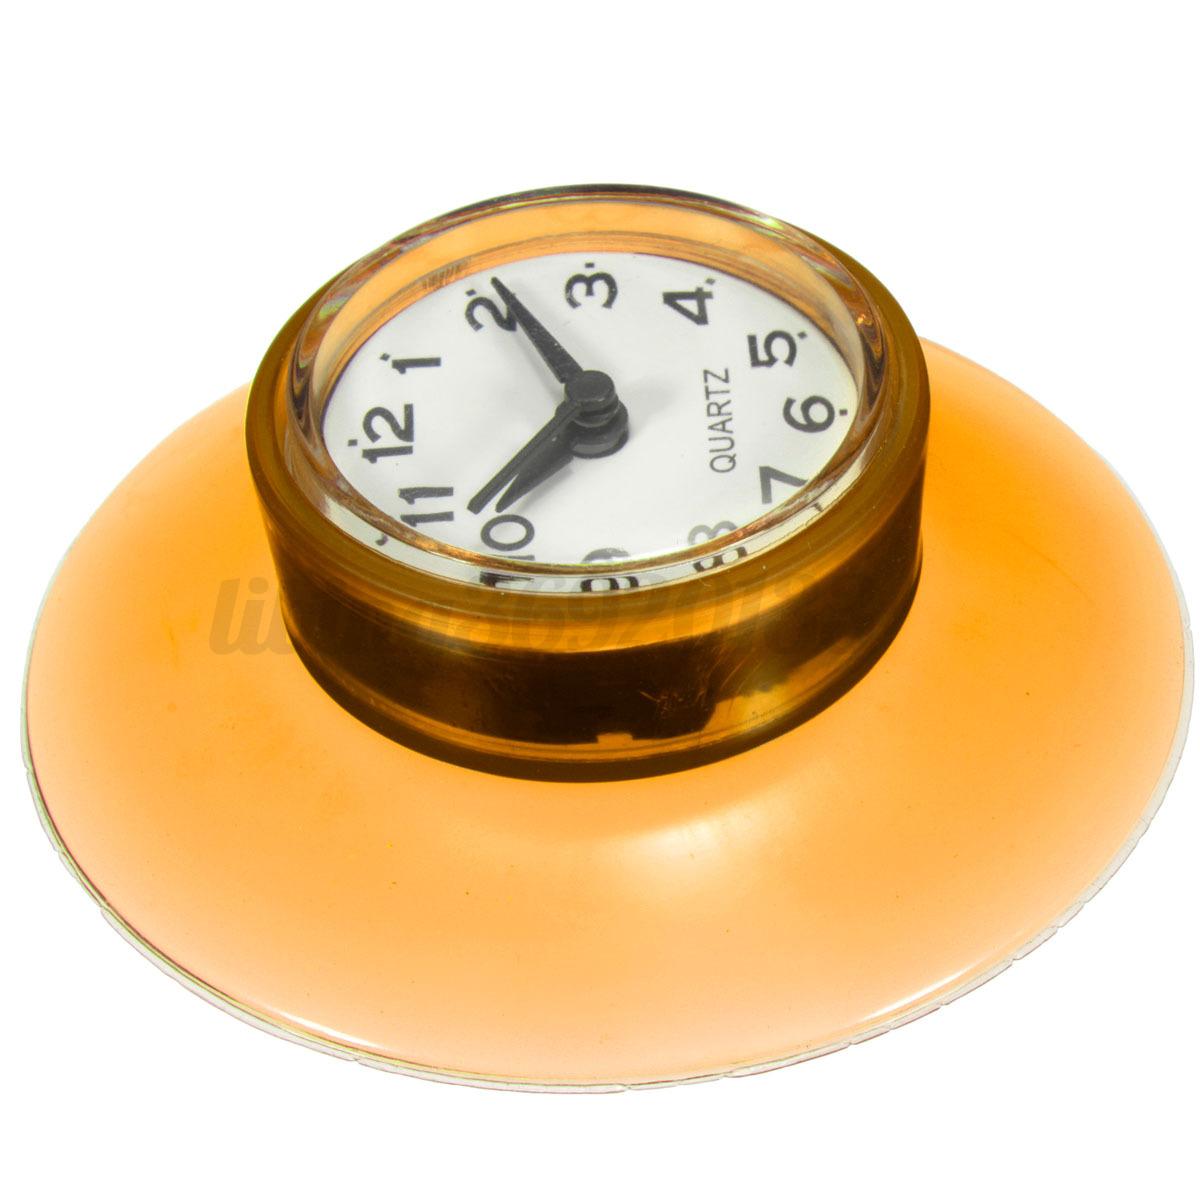 Horloge tanche miroir salle bains cuisine for Aspiration salle de bain